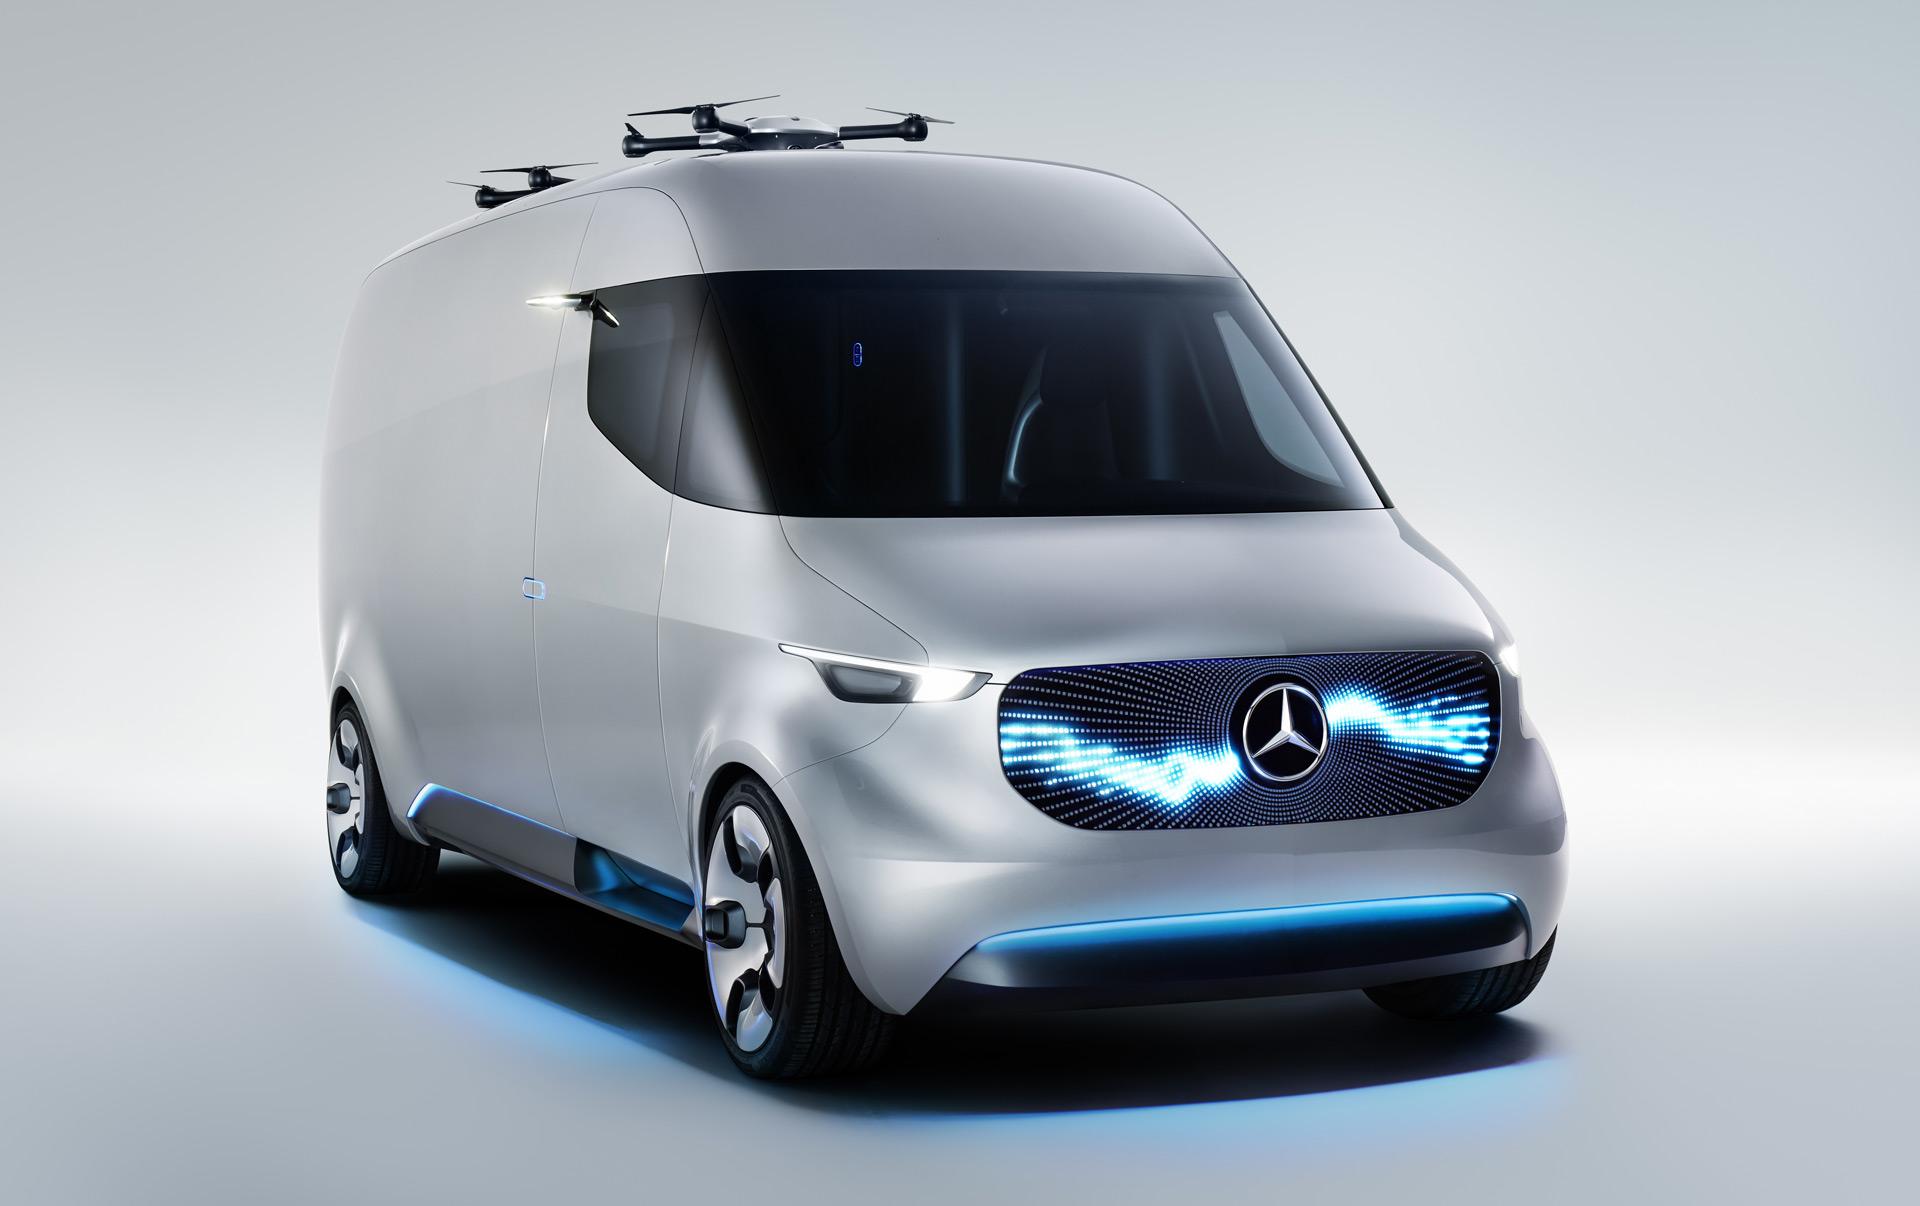 Mercedes previews next-gen Sprinter with Vision Van concept